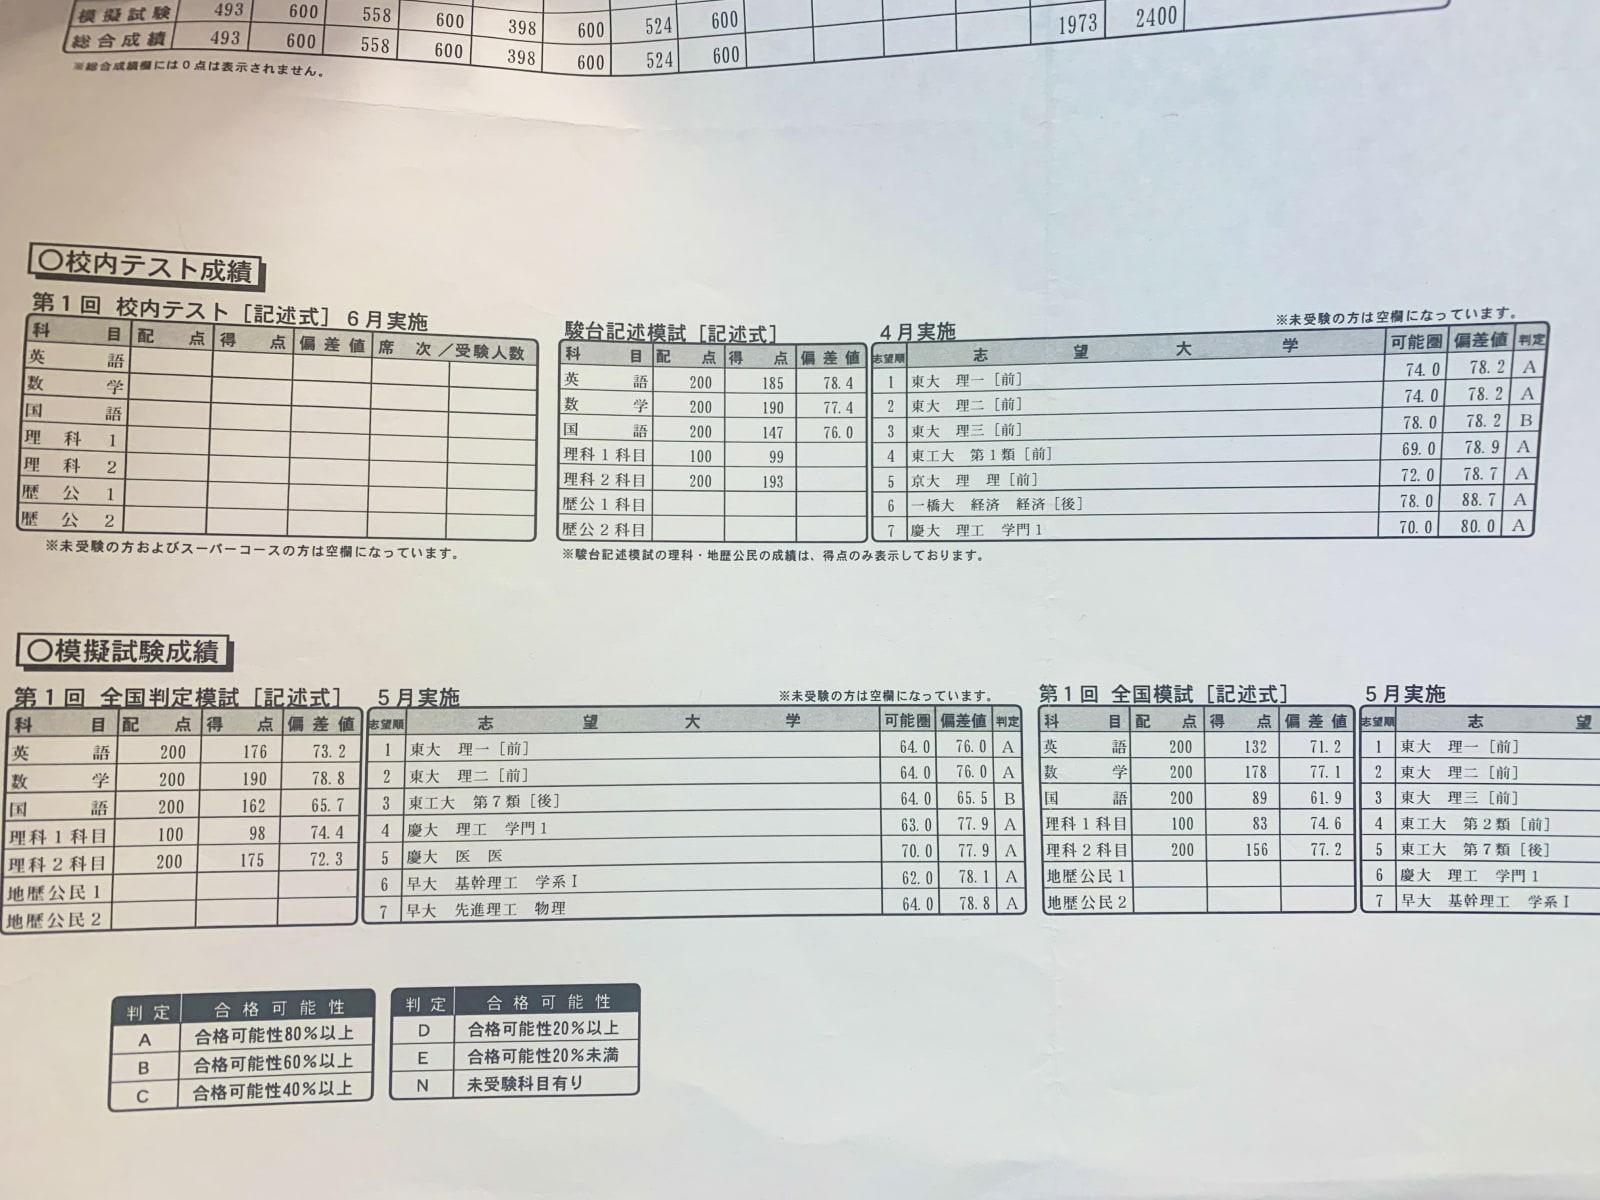 前期の模擬試験の成績一覧